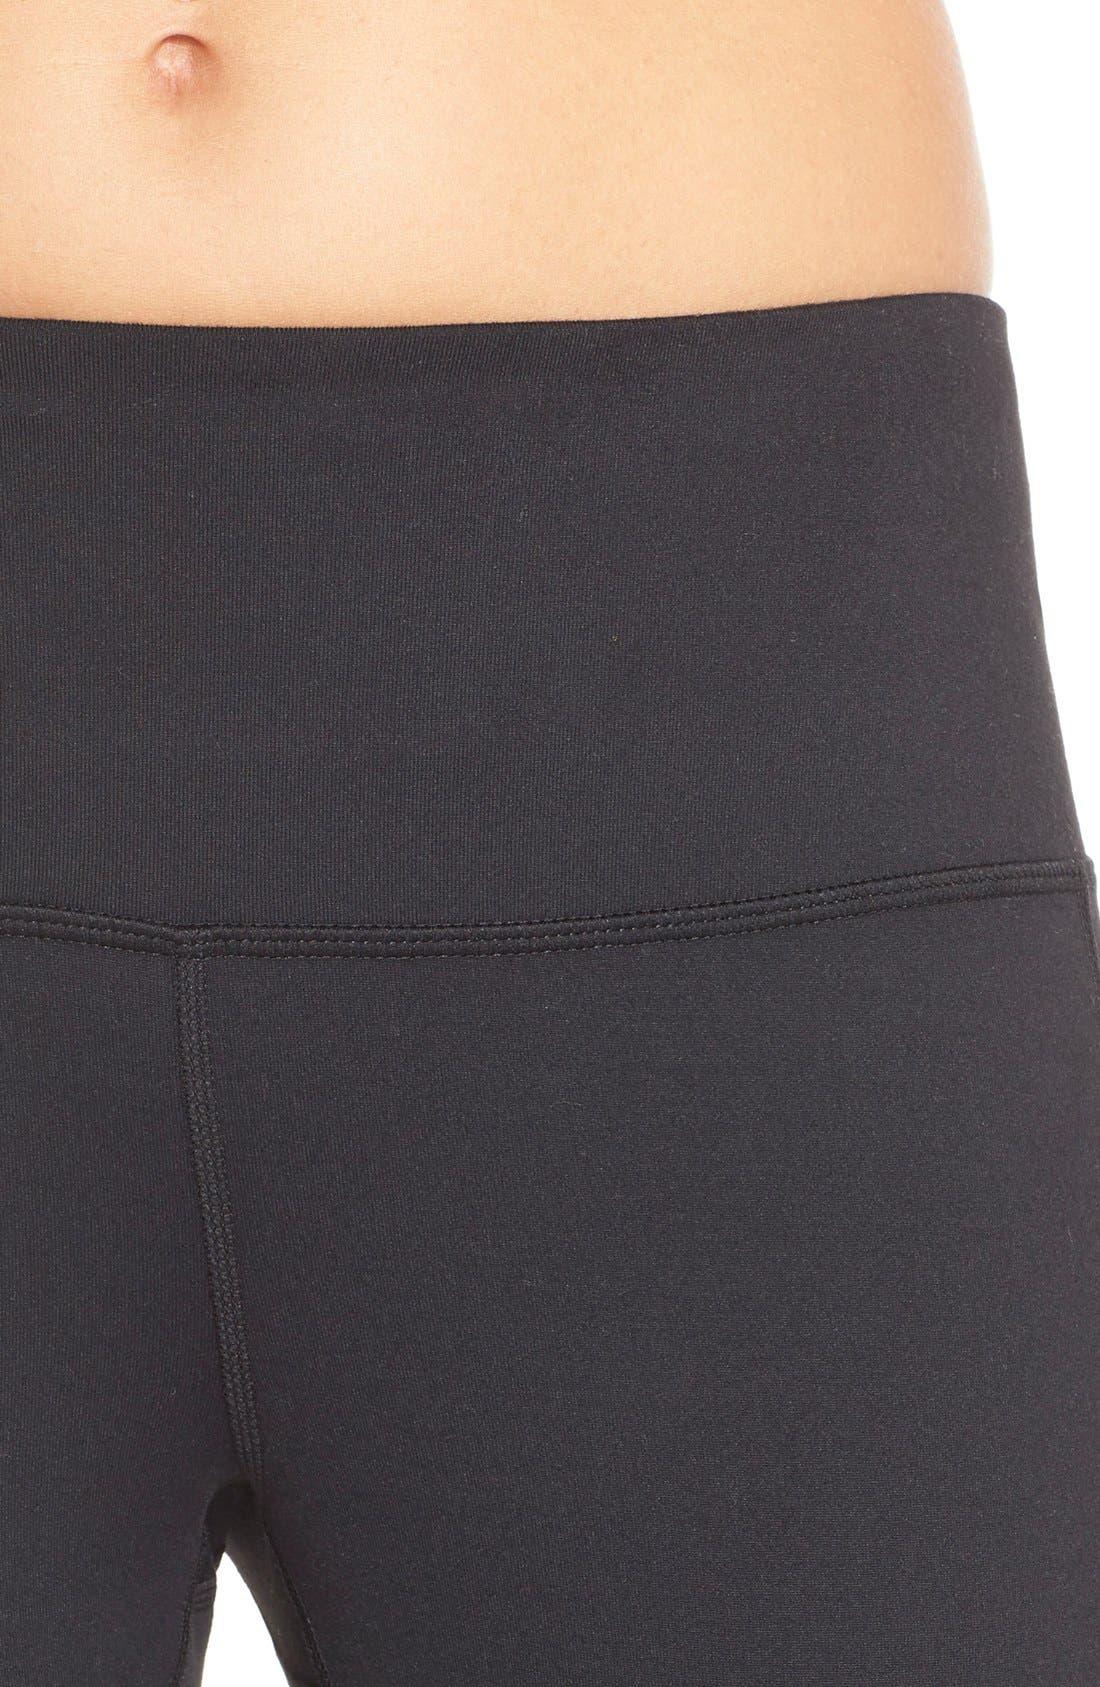 Alternate Image 4  - Zella 'Plank' Pants